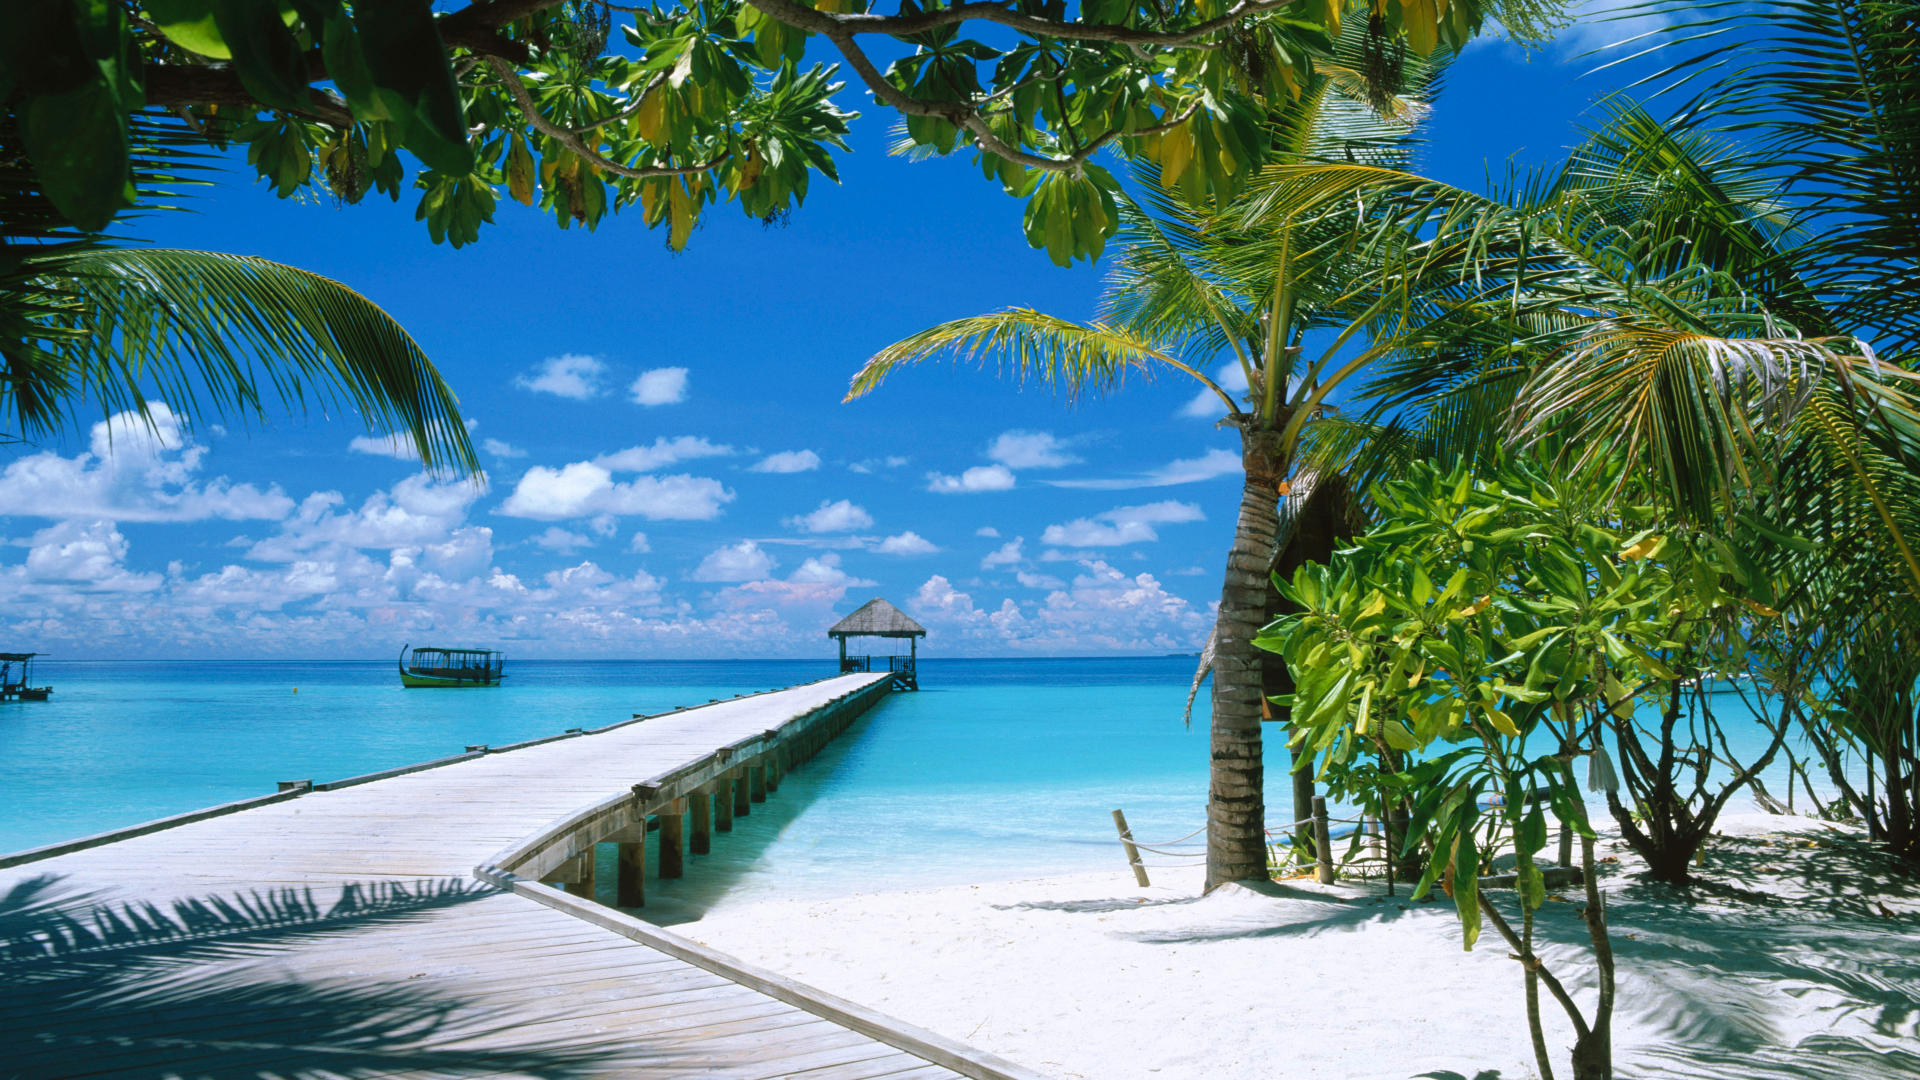 Free Download Fond Ecran Plage Beach Wallpaper Maldives Hd Gratuit 1920x1080 1920x1080 For Your Desktop Mobile Tablet Explore 60 Maldives Beach Wallpaper Maldives Island Resorts Wallpaper Maldives Desktop Wallpaper